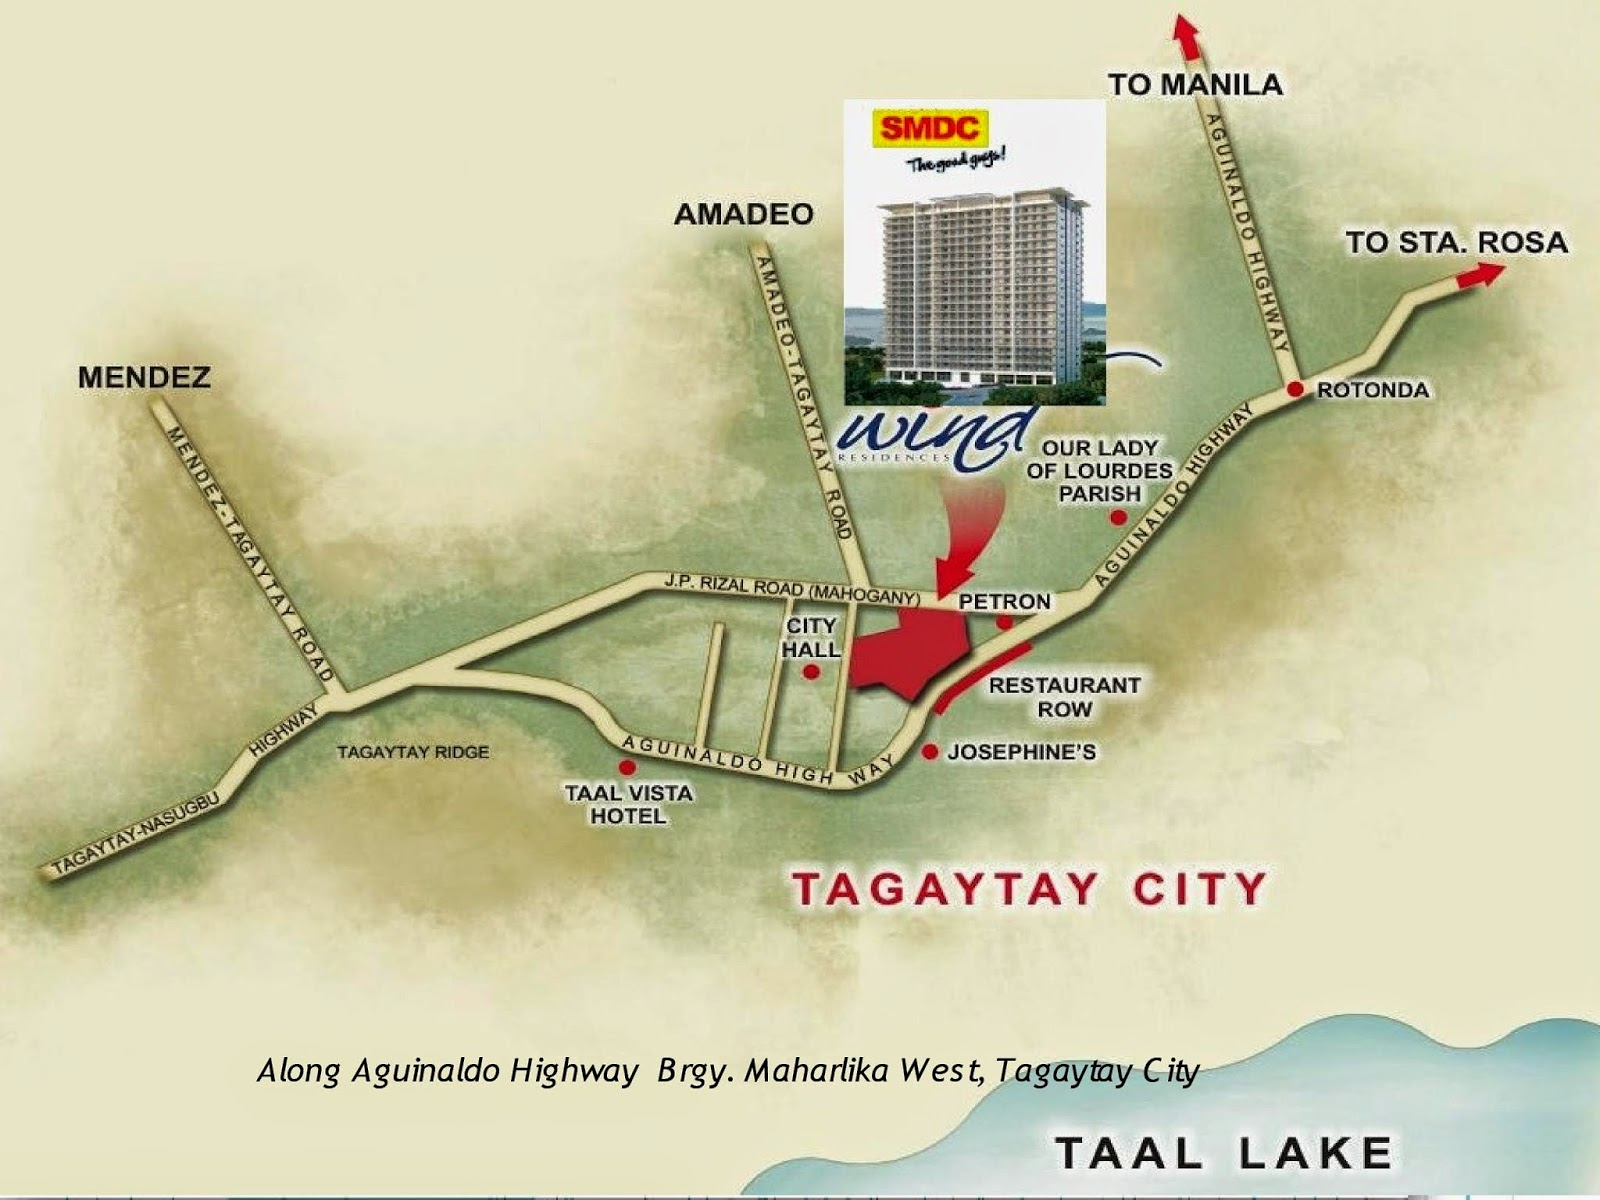 Wind Residences - Tagaytay City